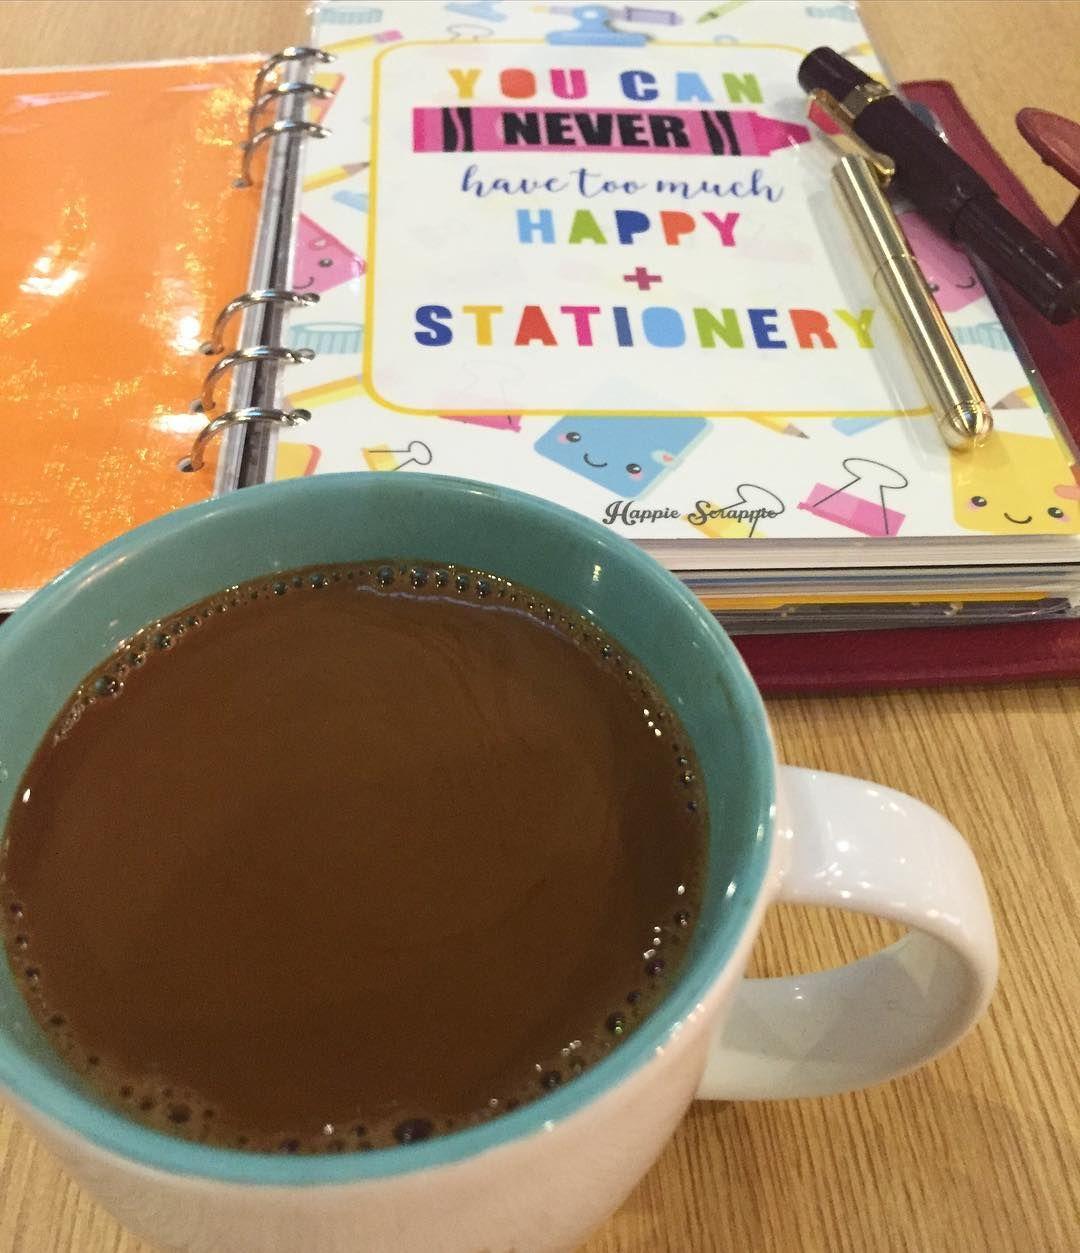 Choose your feeling wisrly because you attract what you feel. Anf today I feel coffee!! #coffee #coffeecup #coffeeaddict #coffeenerd #coffeetime #coffeeholic #kopi #kopiku #localcoffee #sukakopi #stationery #fpgeeks #fountainpen #lamy #kaweco #kawecosport #planner #filofax #filofaxaddict #filofaxcalipso by xaverian94